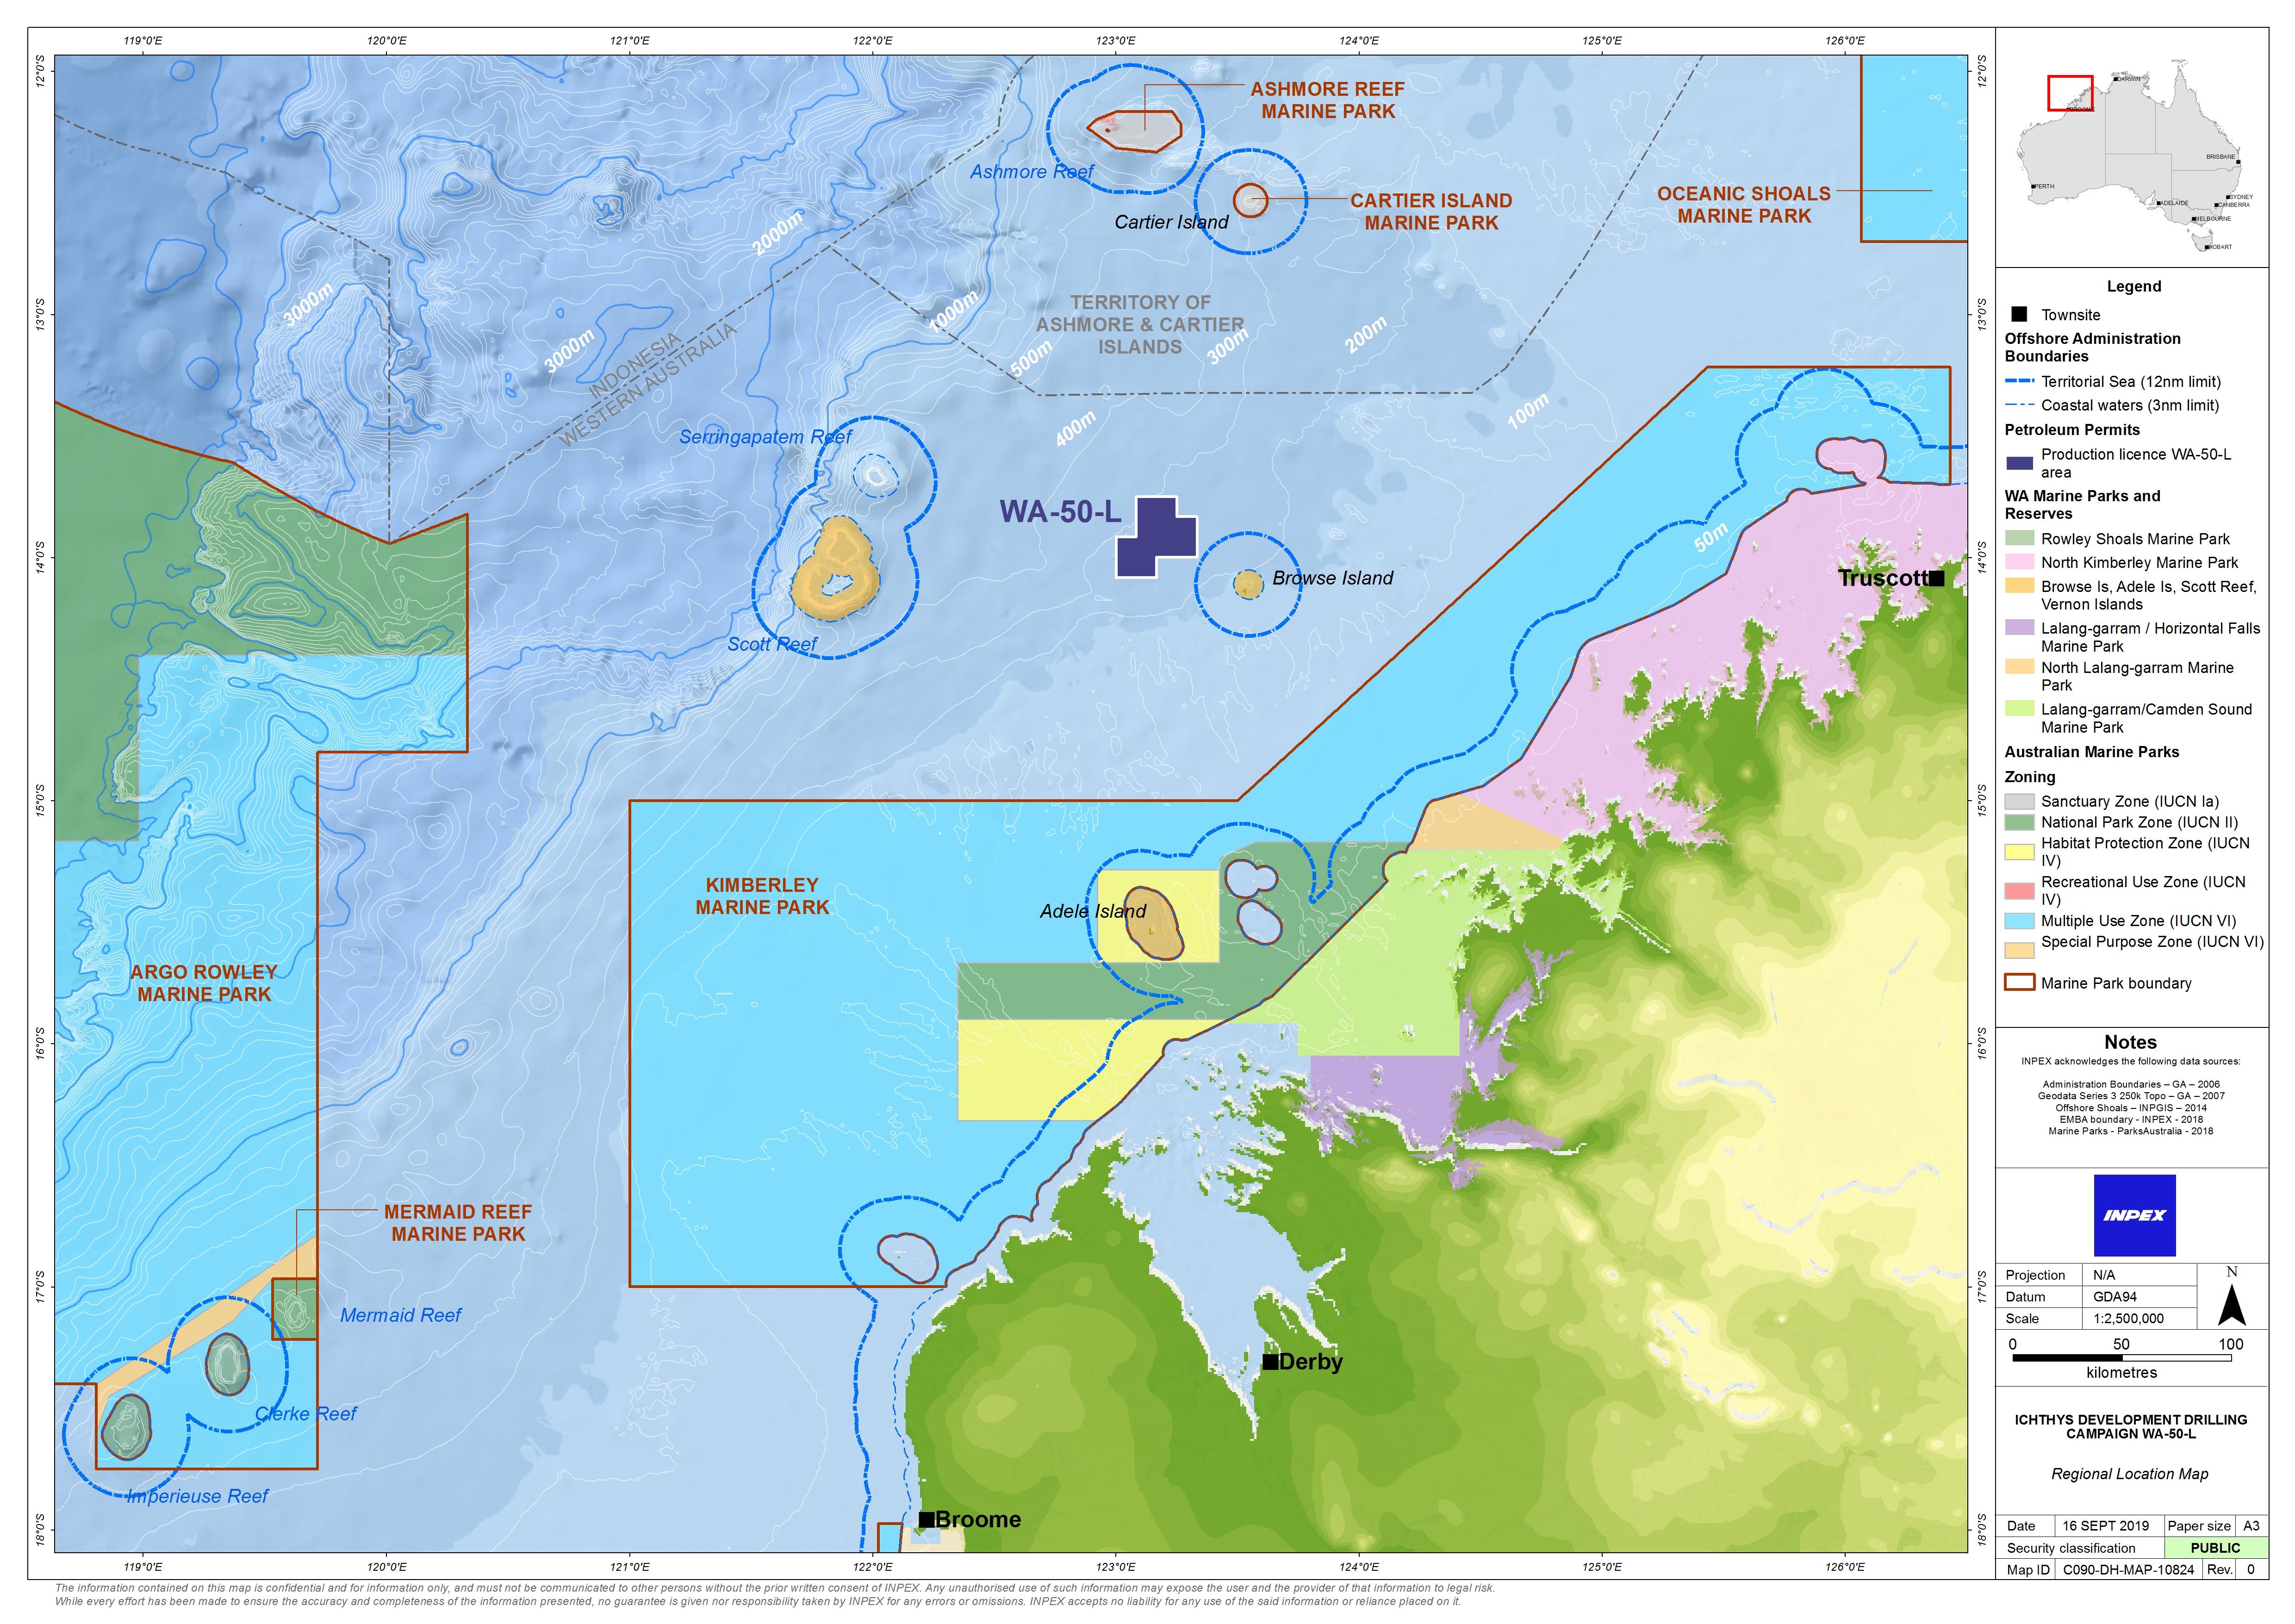 Location map - Activity: Ichthys Development Drilling Campaign WA-50-L - Phase 2 (refer to description)